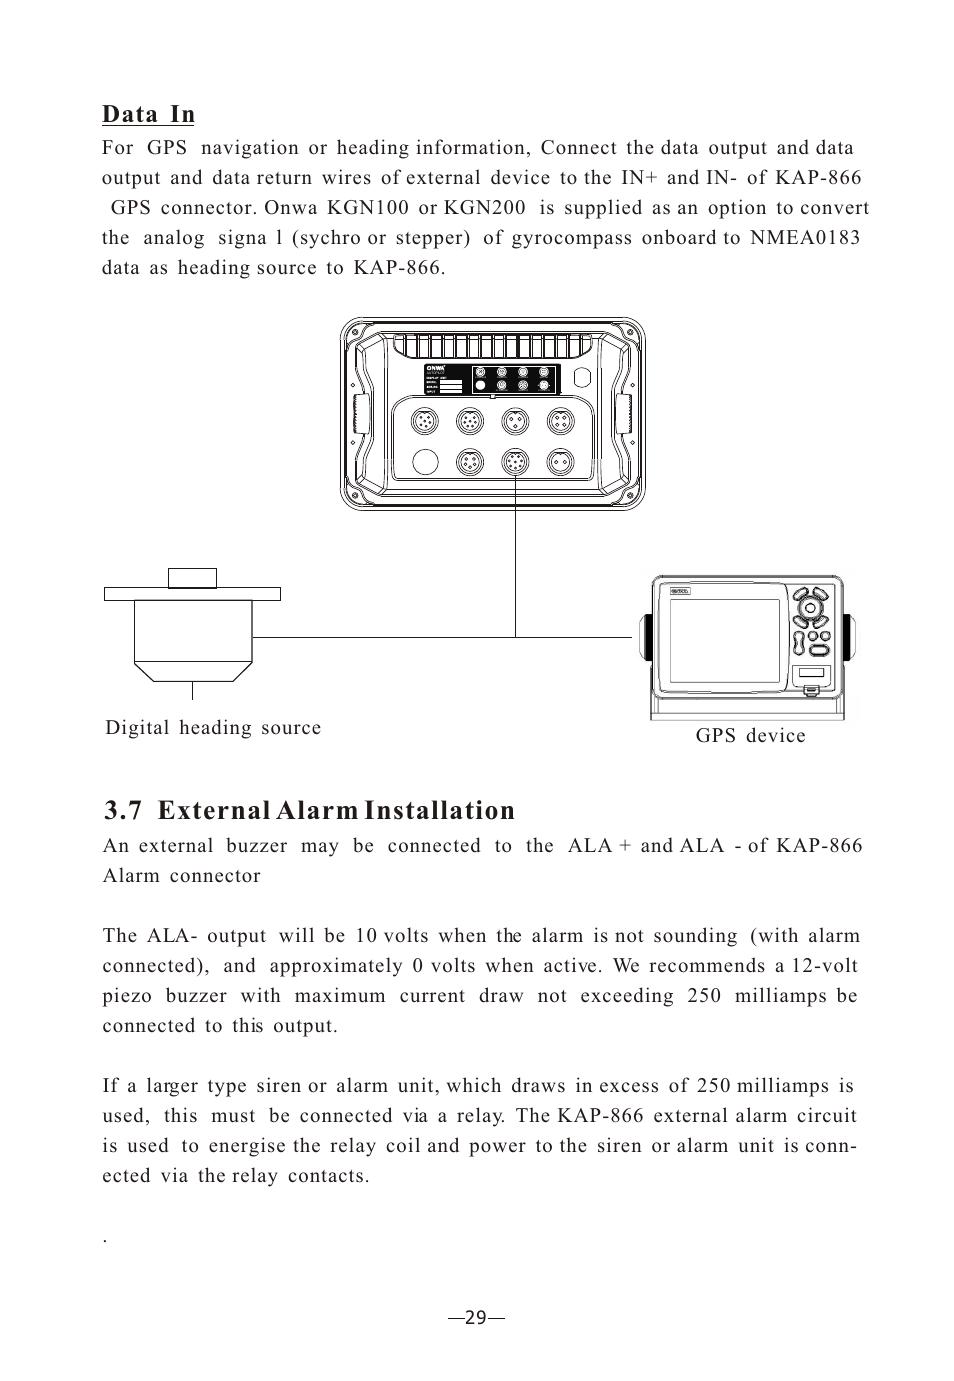 34 7 External Alarm Installation Data In Onwa Marine Piezo Buzzer Circuit Electronics Kap 866 User Manual Page 44